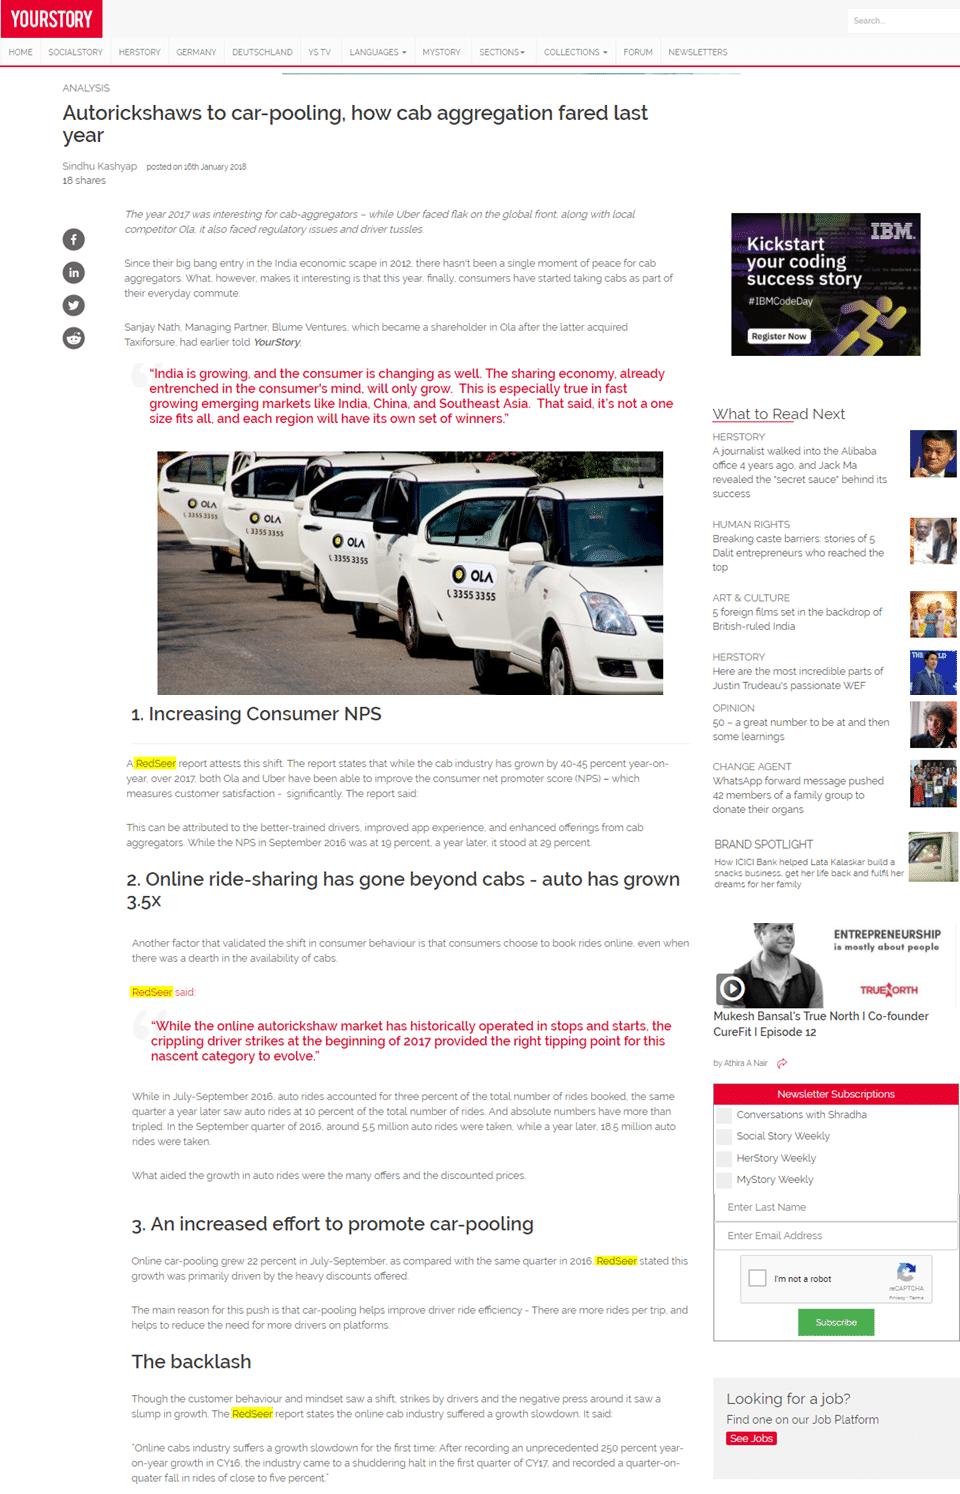 Autorickshaws to car-pooling, how cab aggregation fared last year